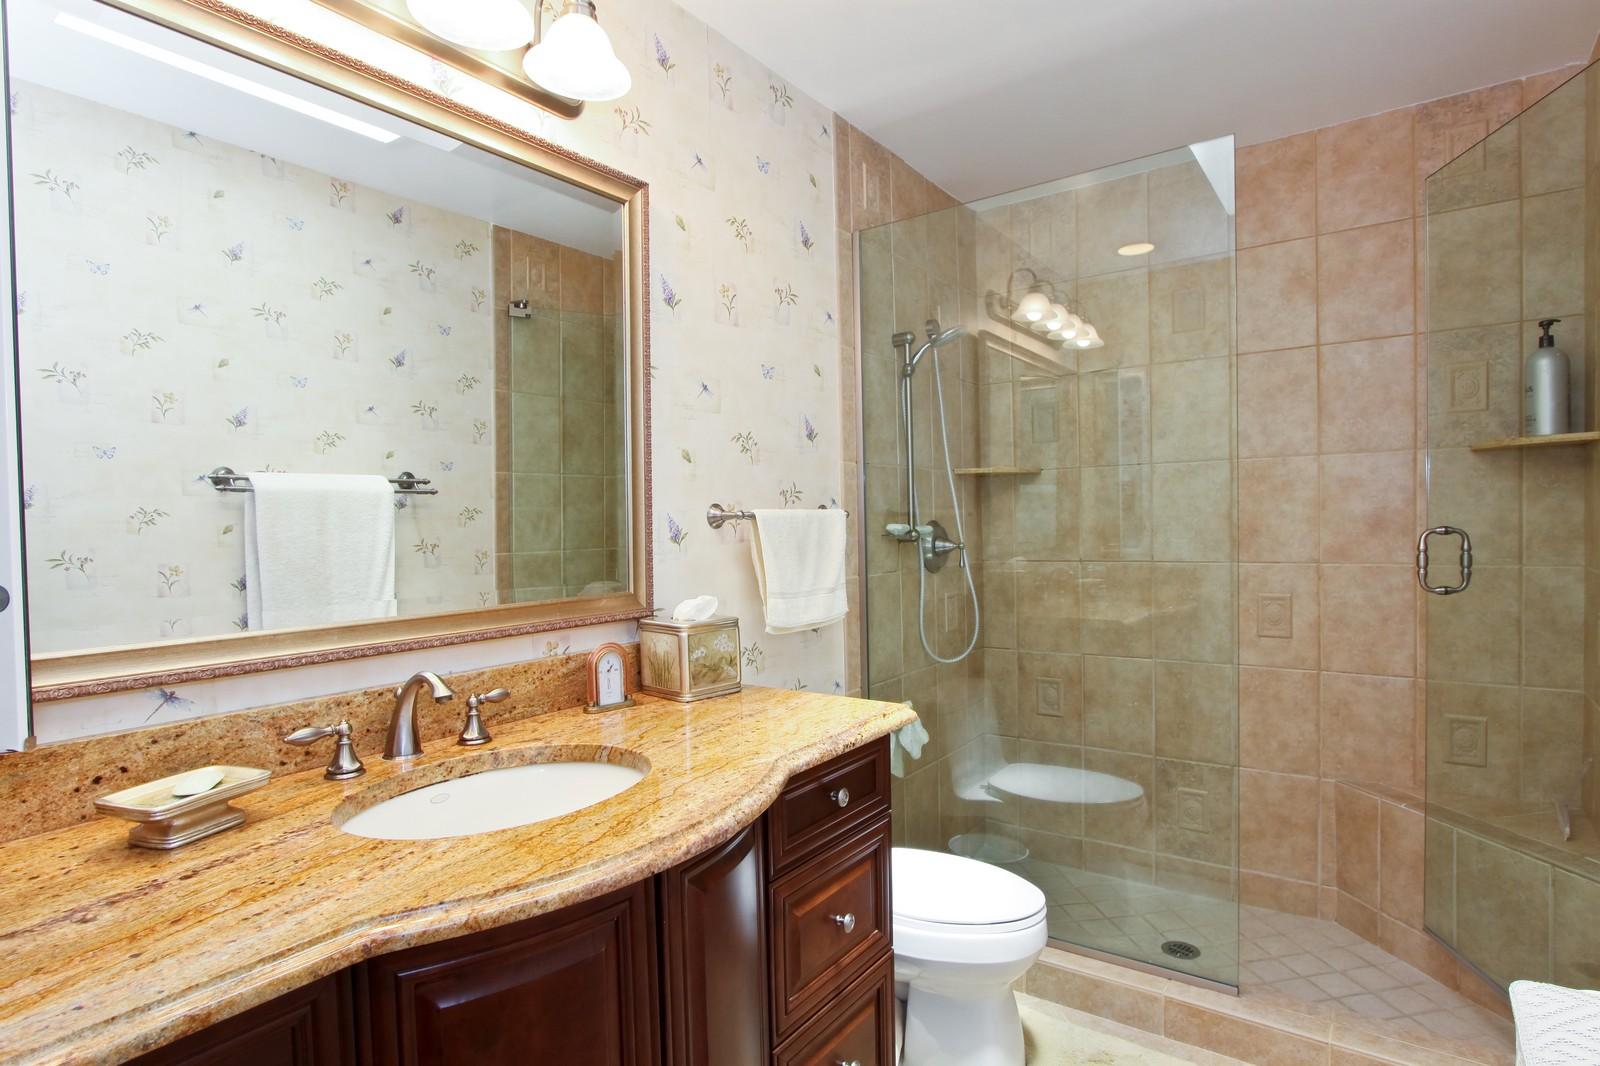 Real Estate Photography - 1986 Imperial GC Blvd, Naples, FL, 34110 - Bathroom